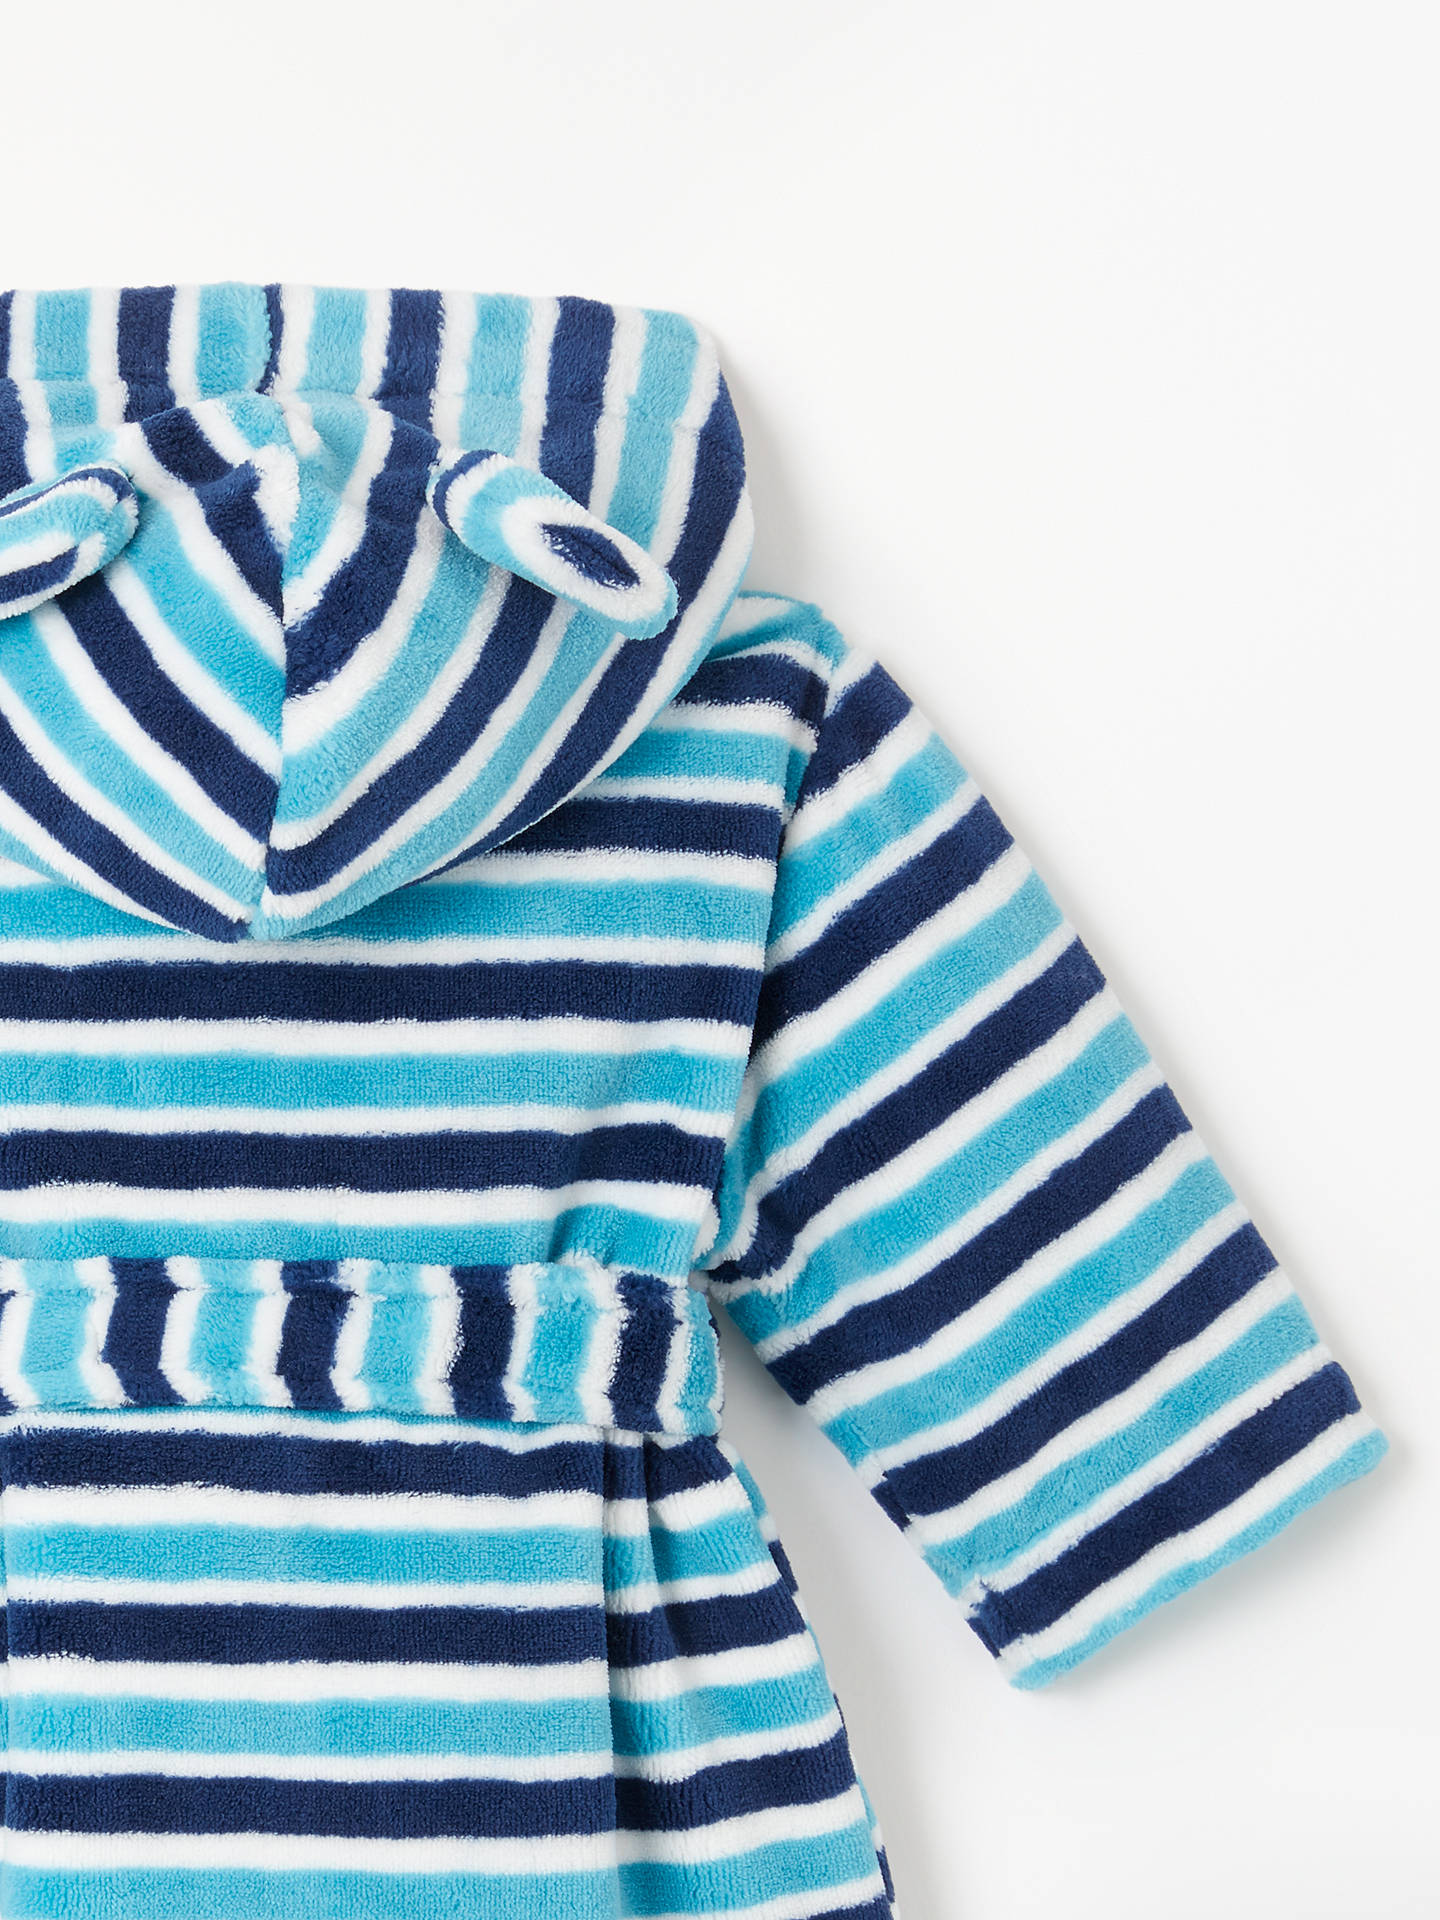 John Lewis & Partners Baby Stripe Dressing Gown at John Lewis & Partners